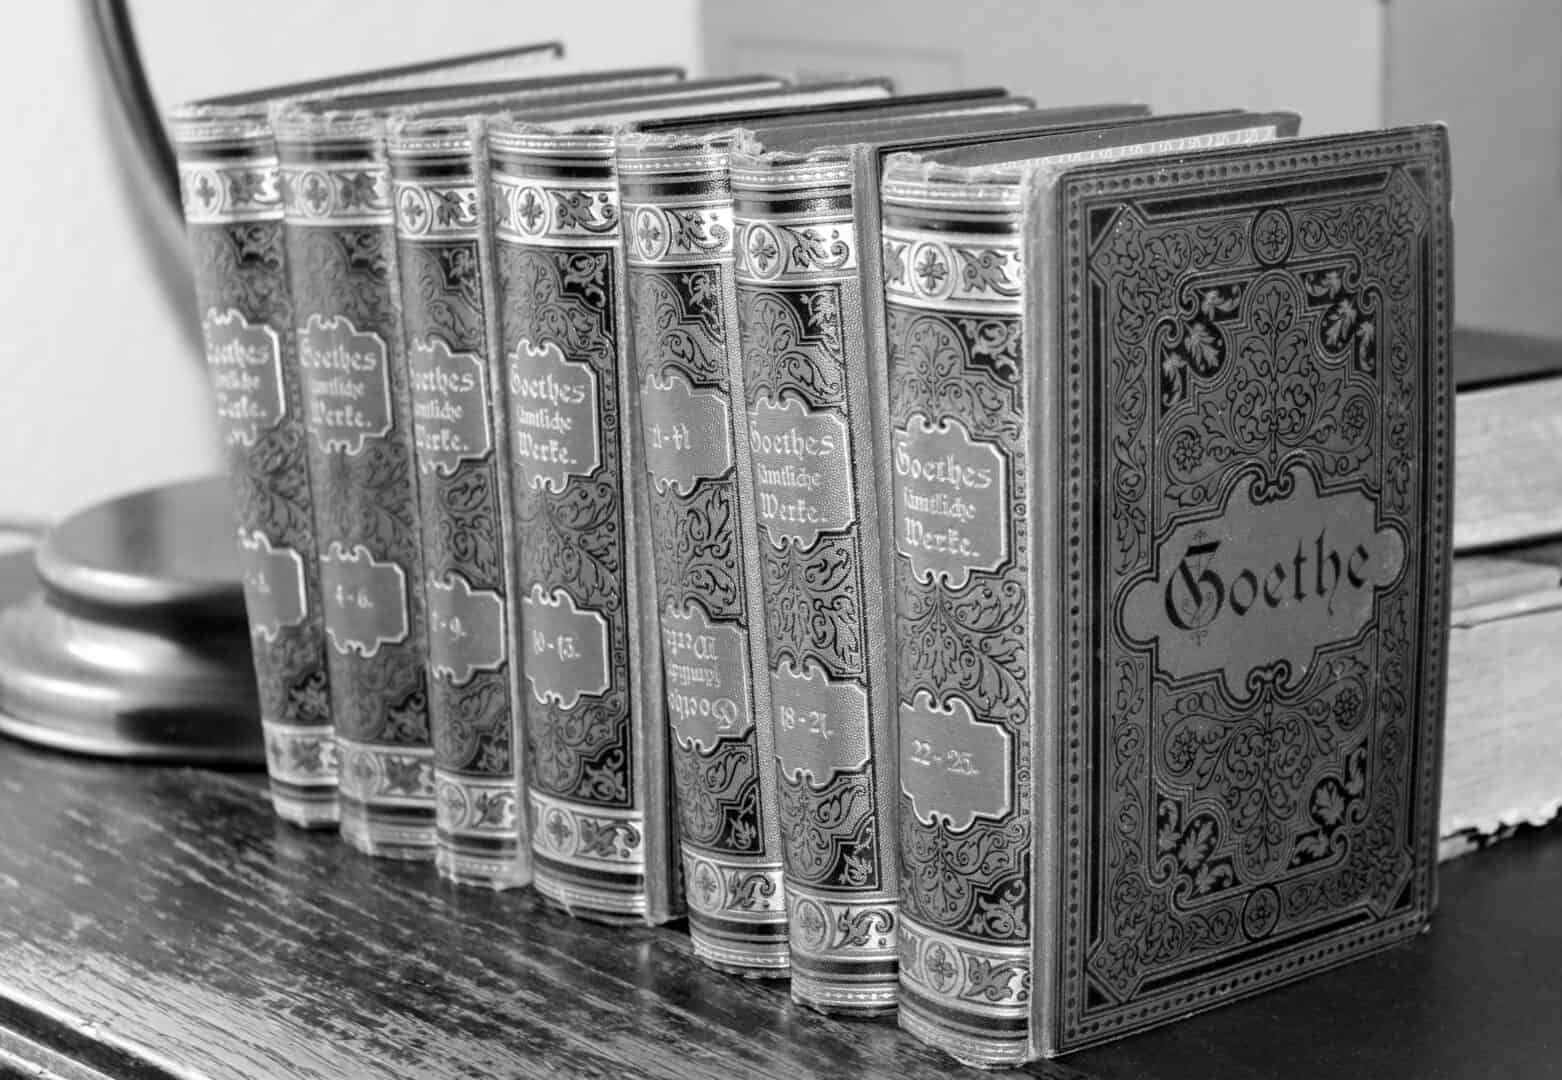 Goethes Botschaft an die heutige Medizin